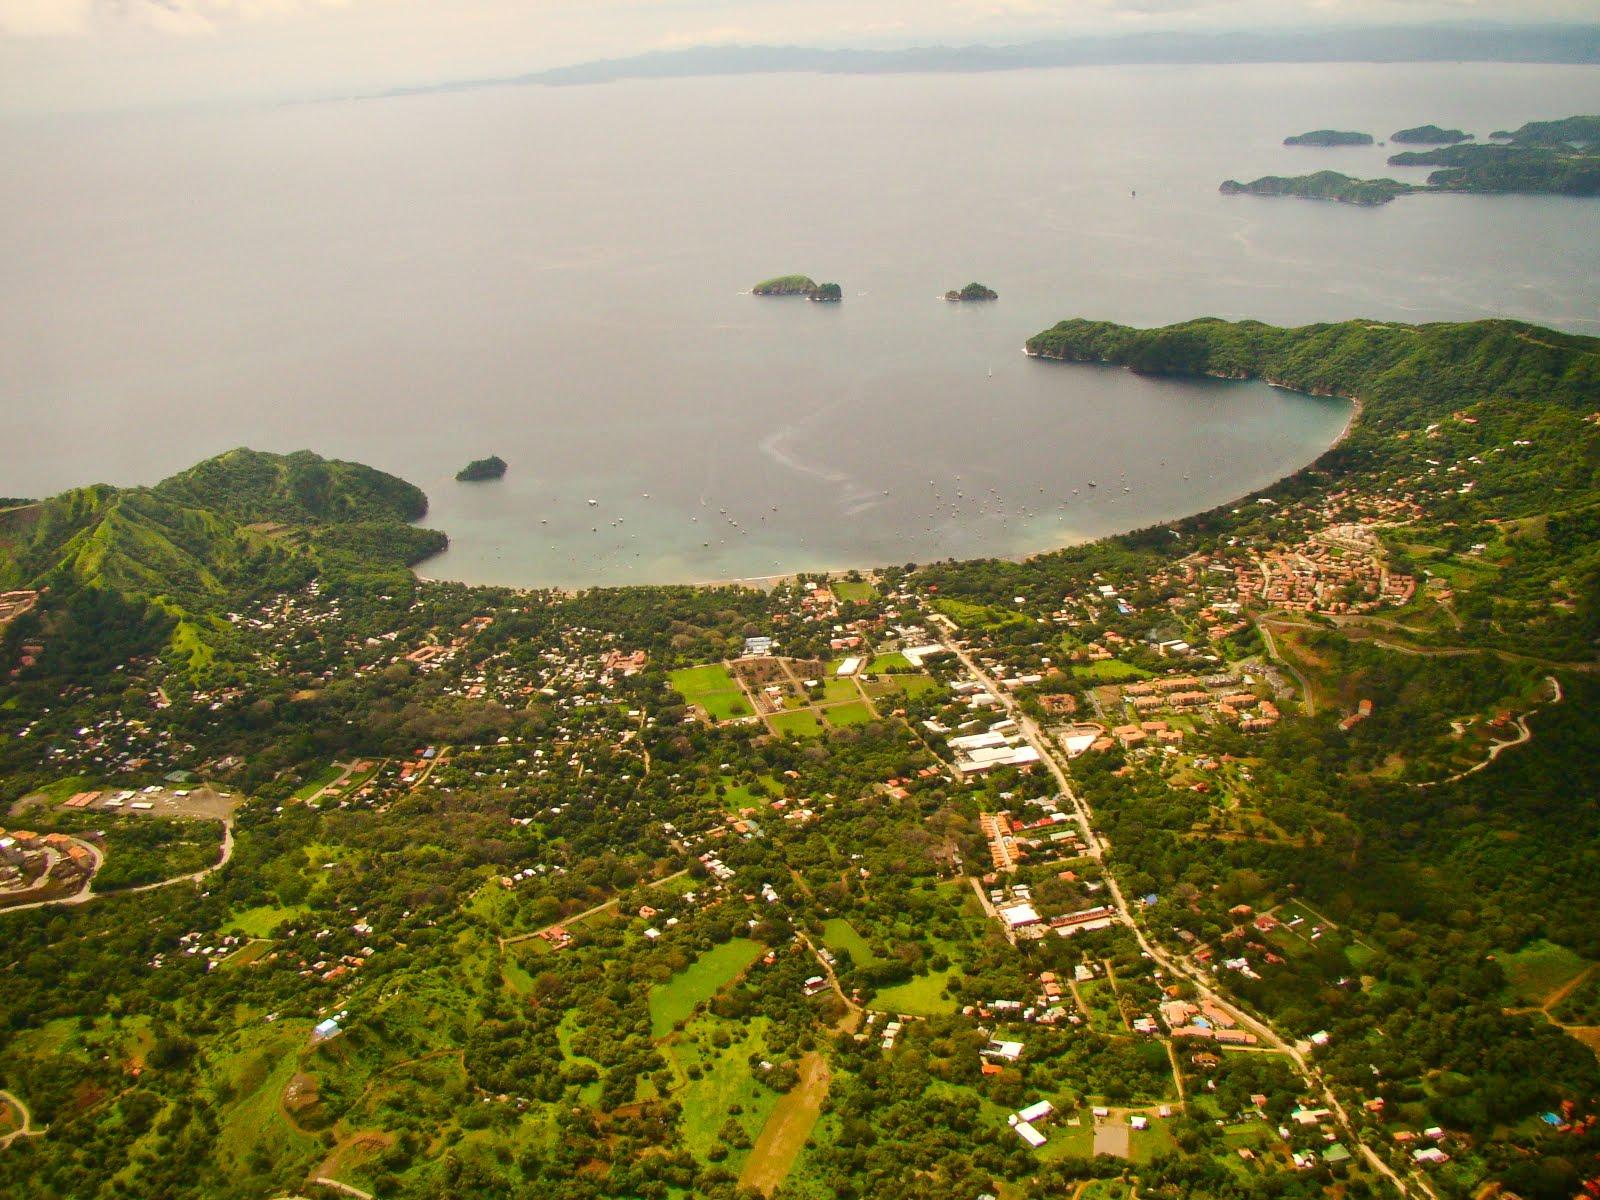 Tamarindo, Costa Rica Daily Photo: Scenery on approach to Liberia ...